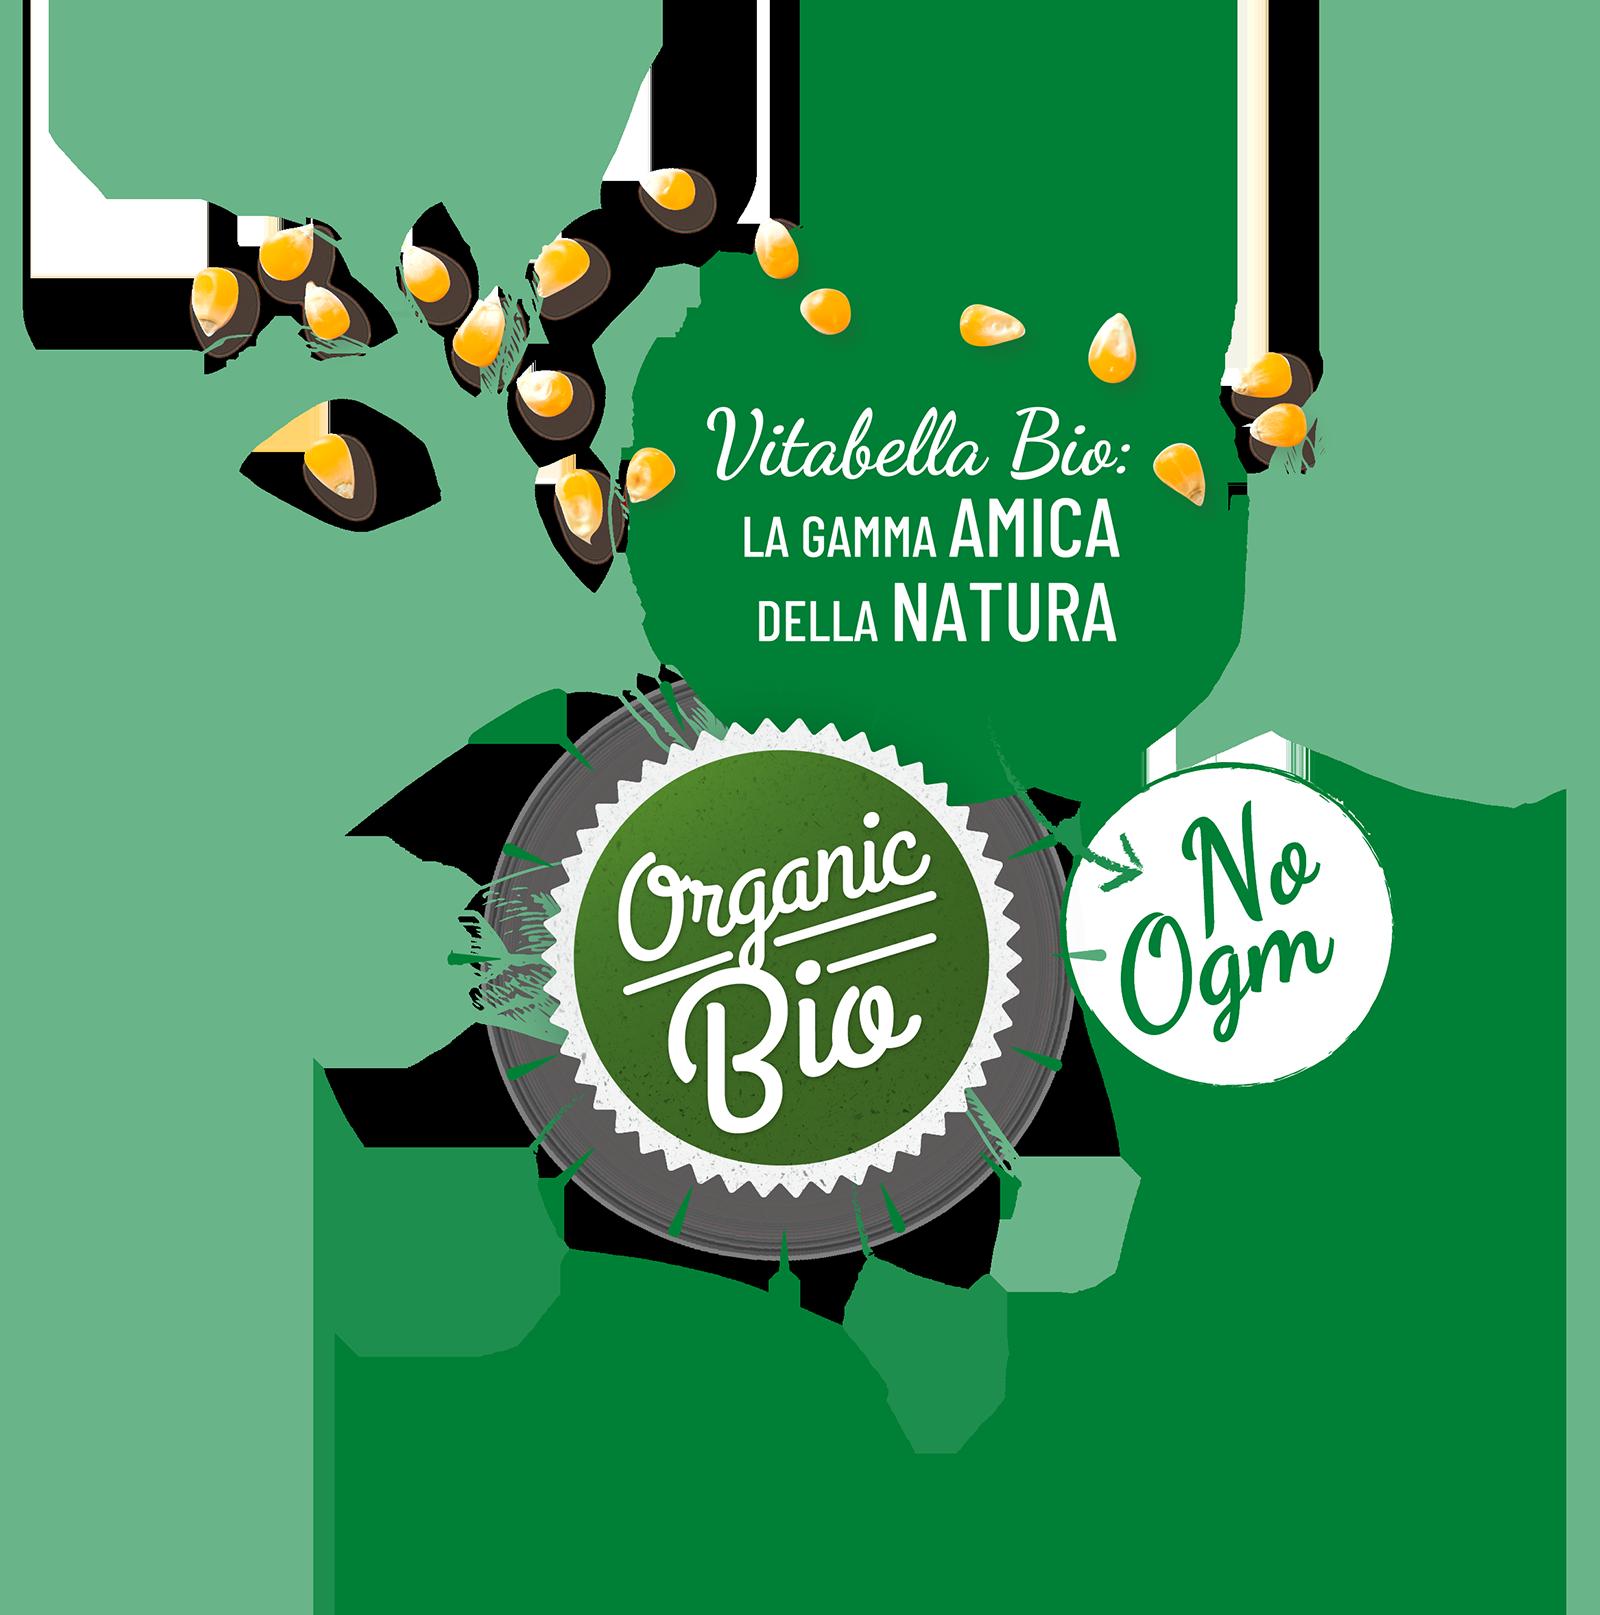 Vitabella Organic Bio No Ogm, 100% Naturali E Biologici